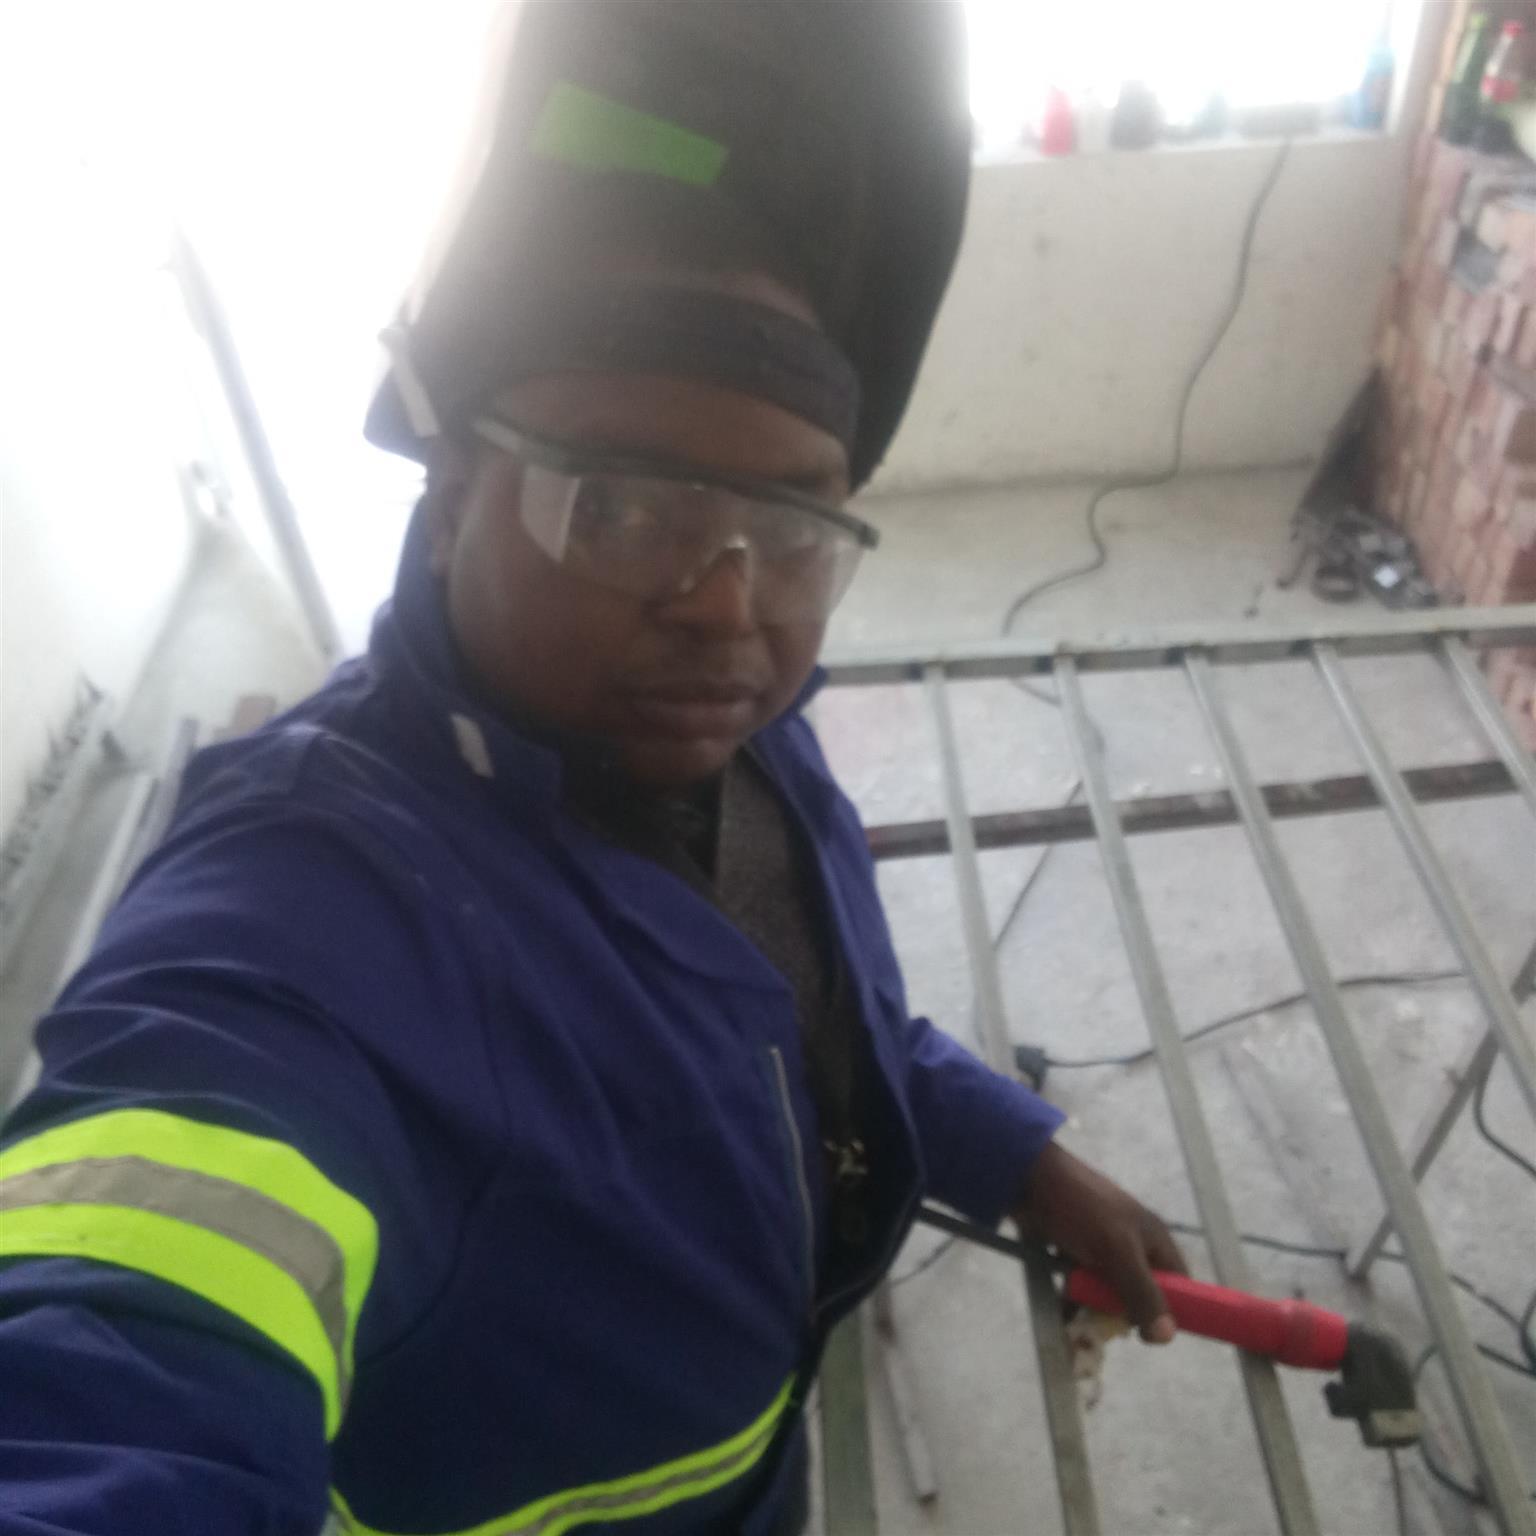 Welding and steel fabrication